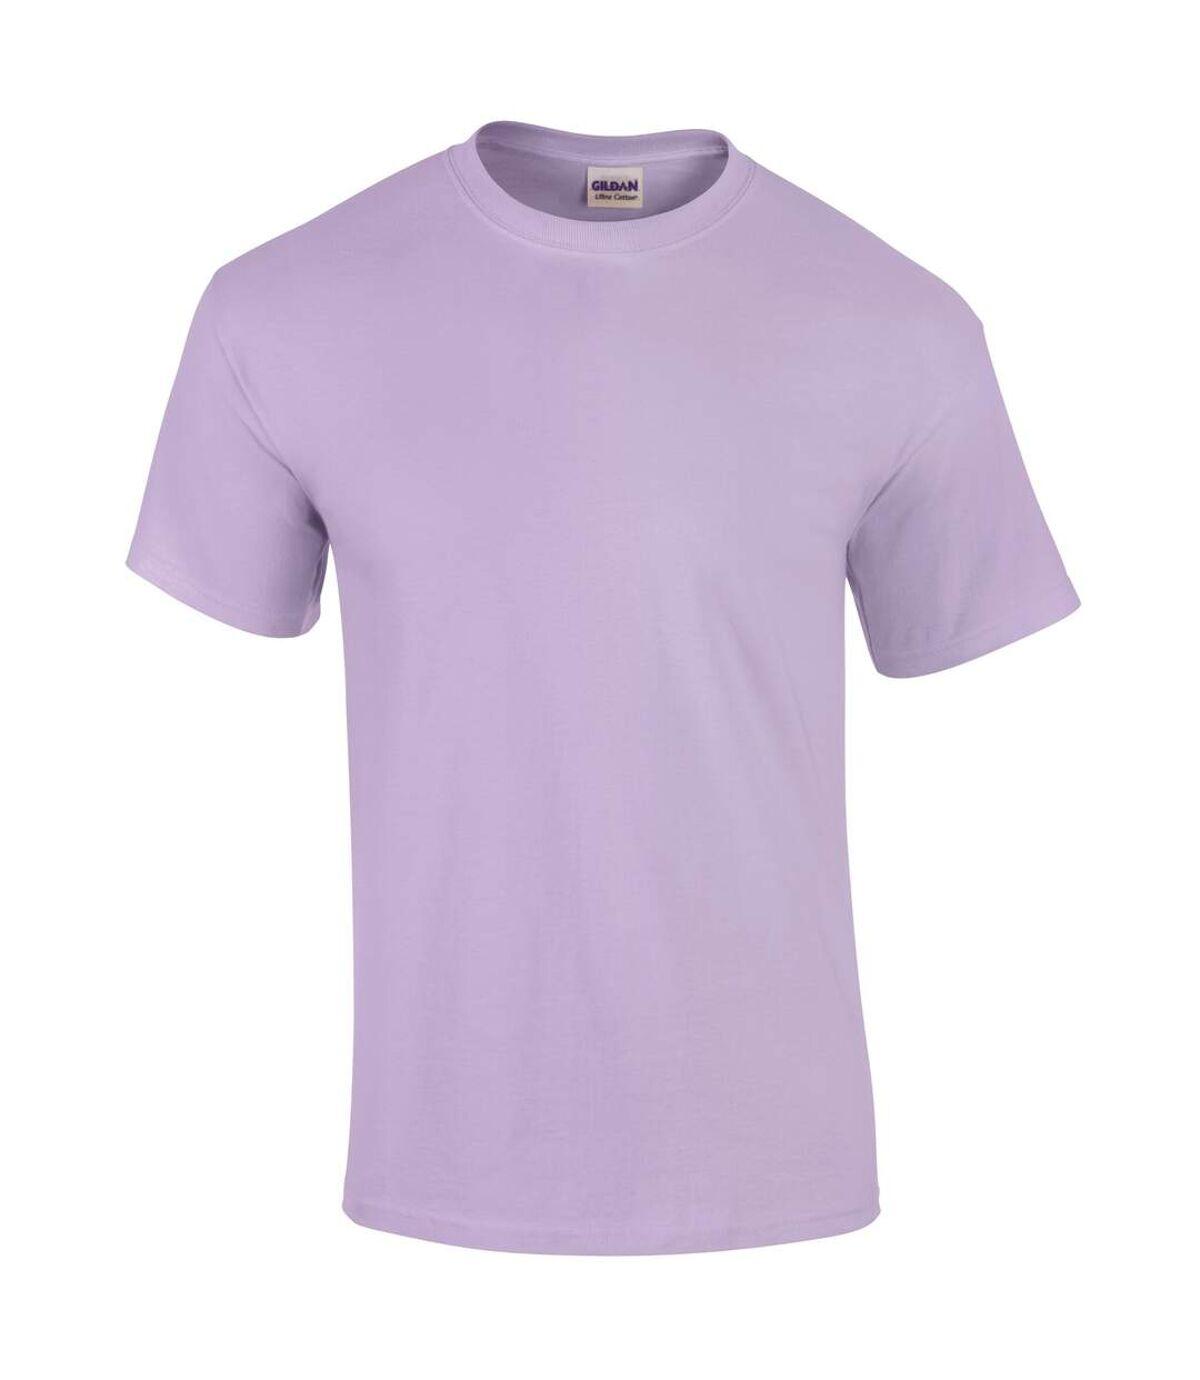 Gildan Mens Ultra Cotton Short Sleeve T-Shirt (Orchid) - UTBC475